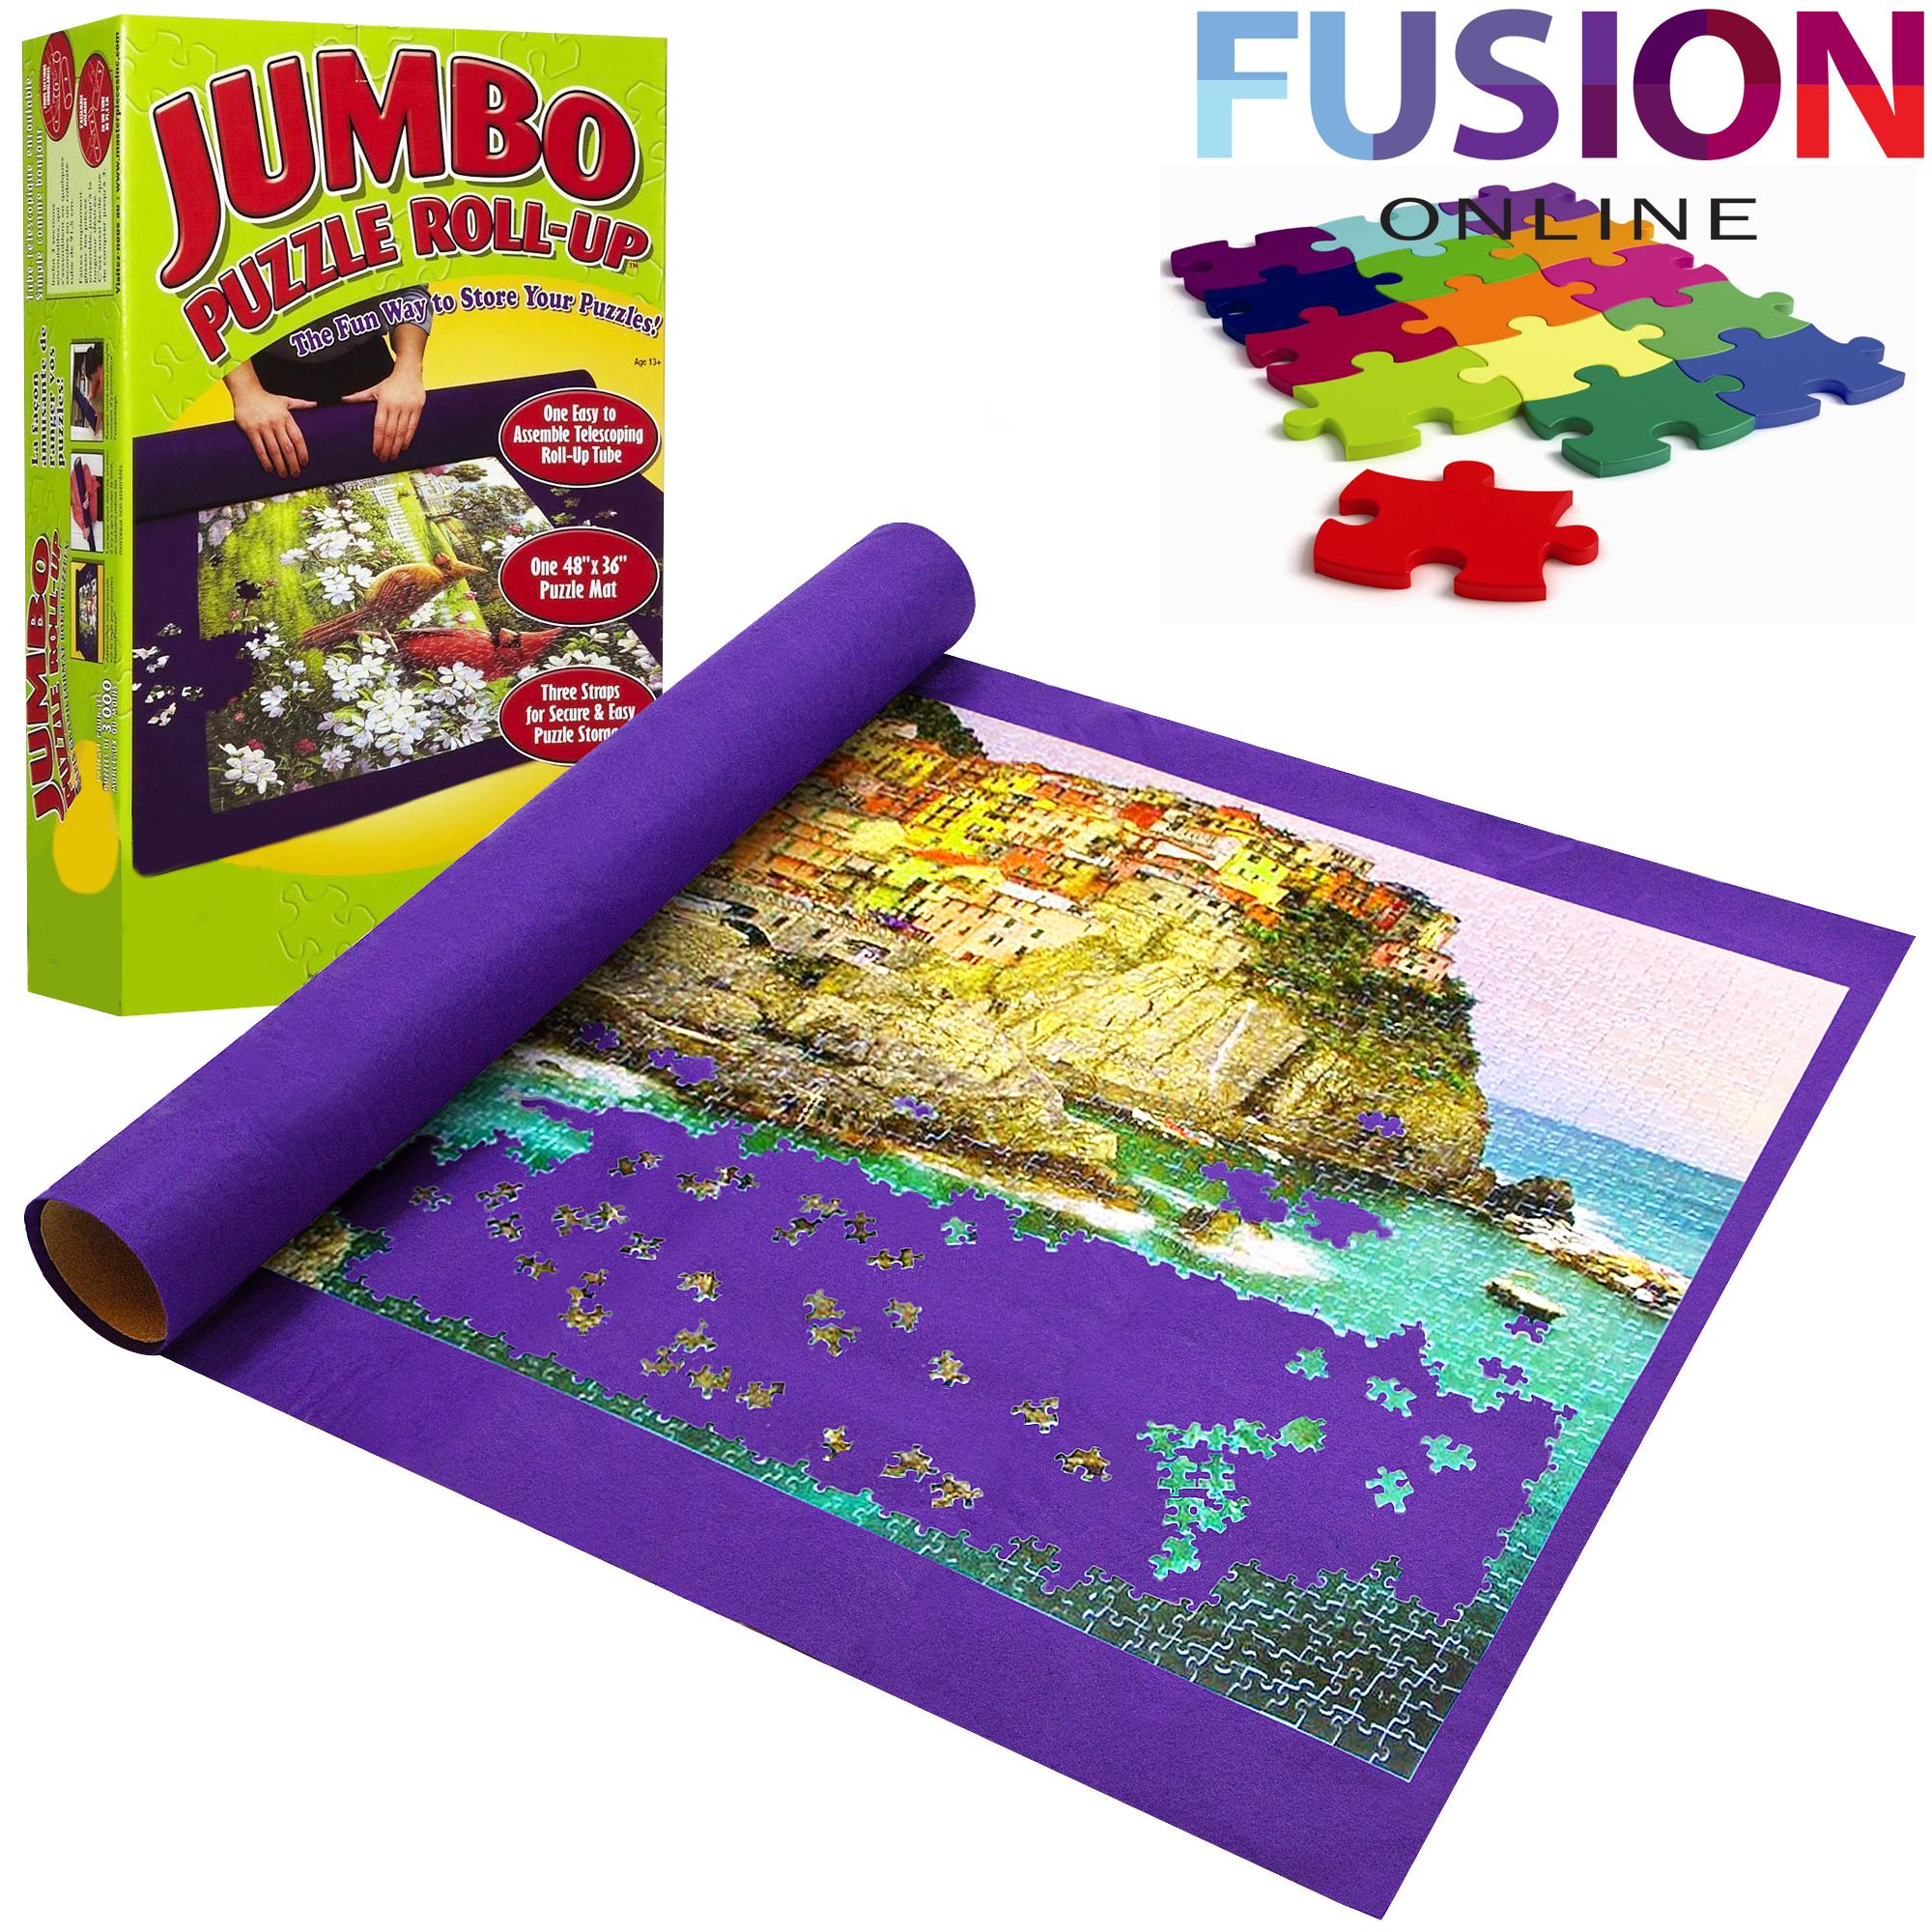 Giant Puzzle Roll up Mat Jigsaw Jumbo